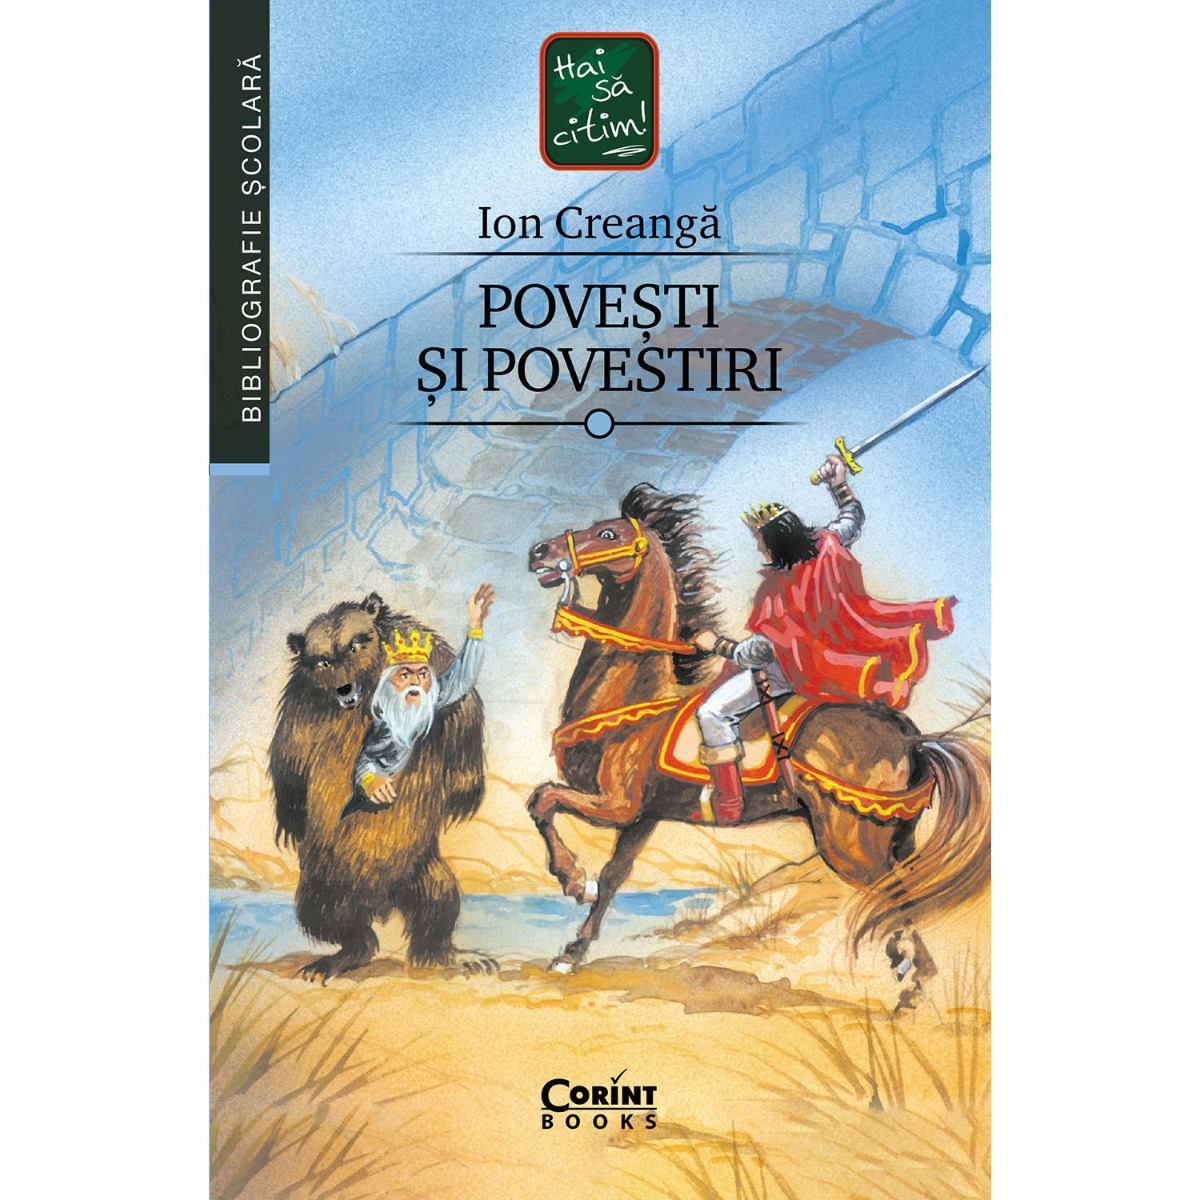 Carte Editura Corint, Povesti si povestiri, Ion Creanga